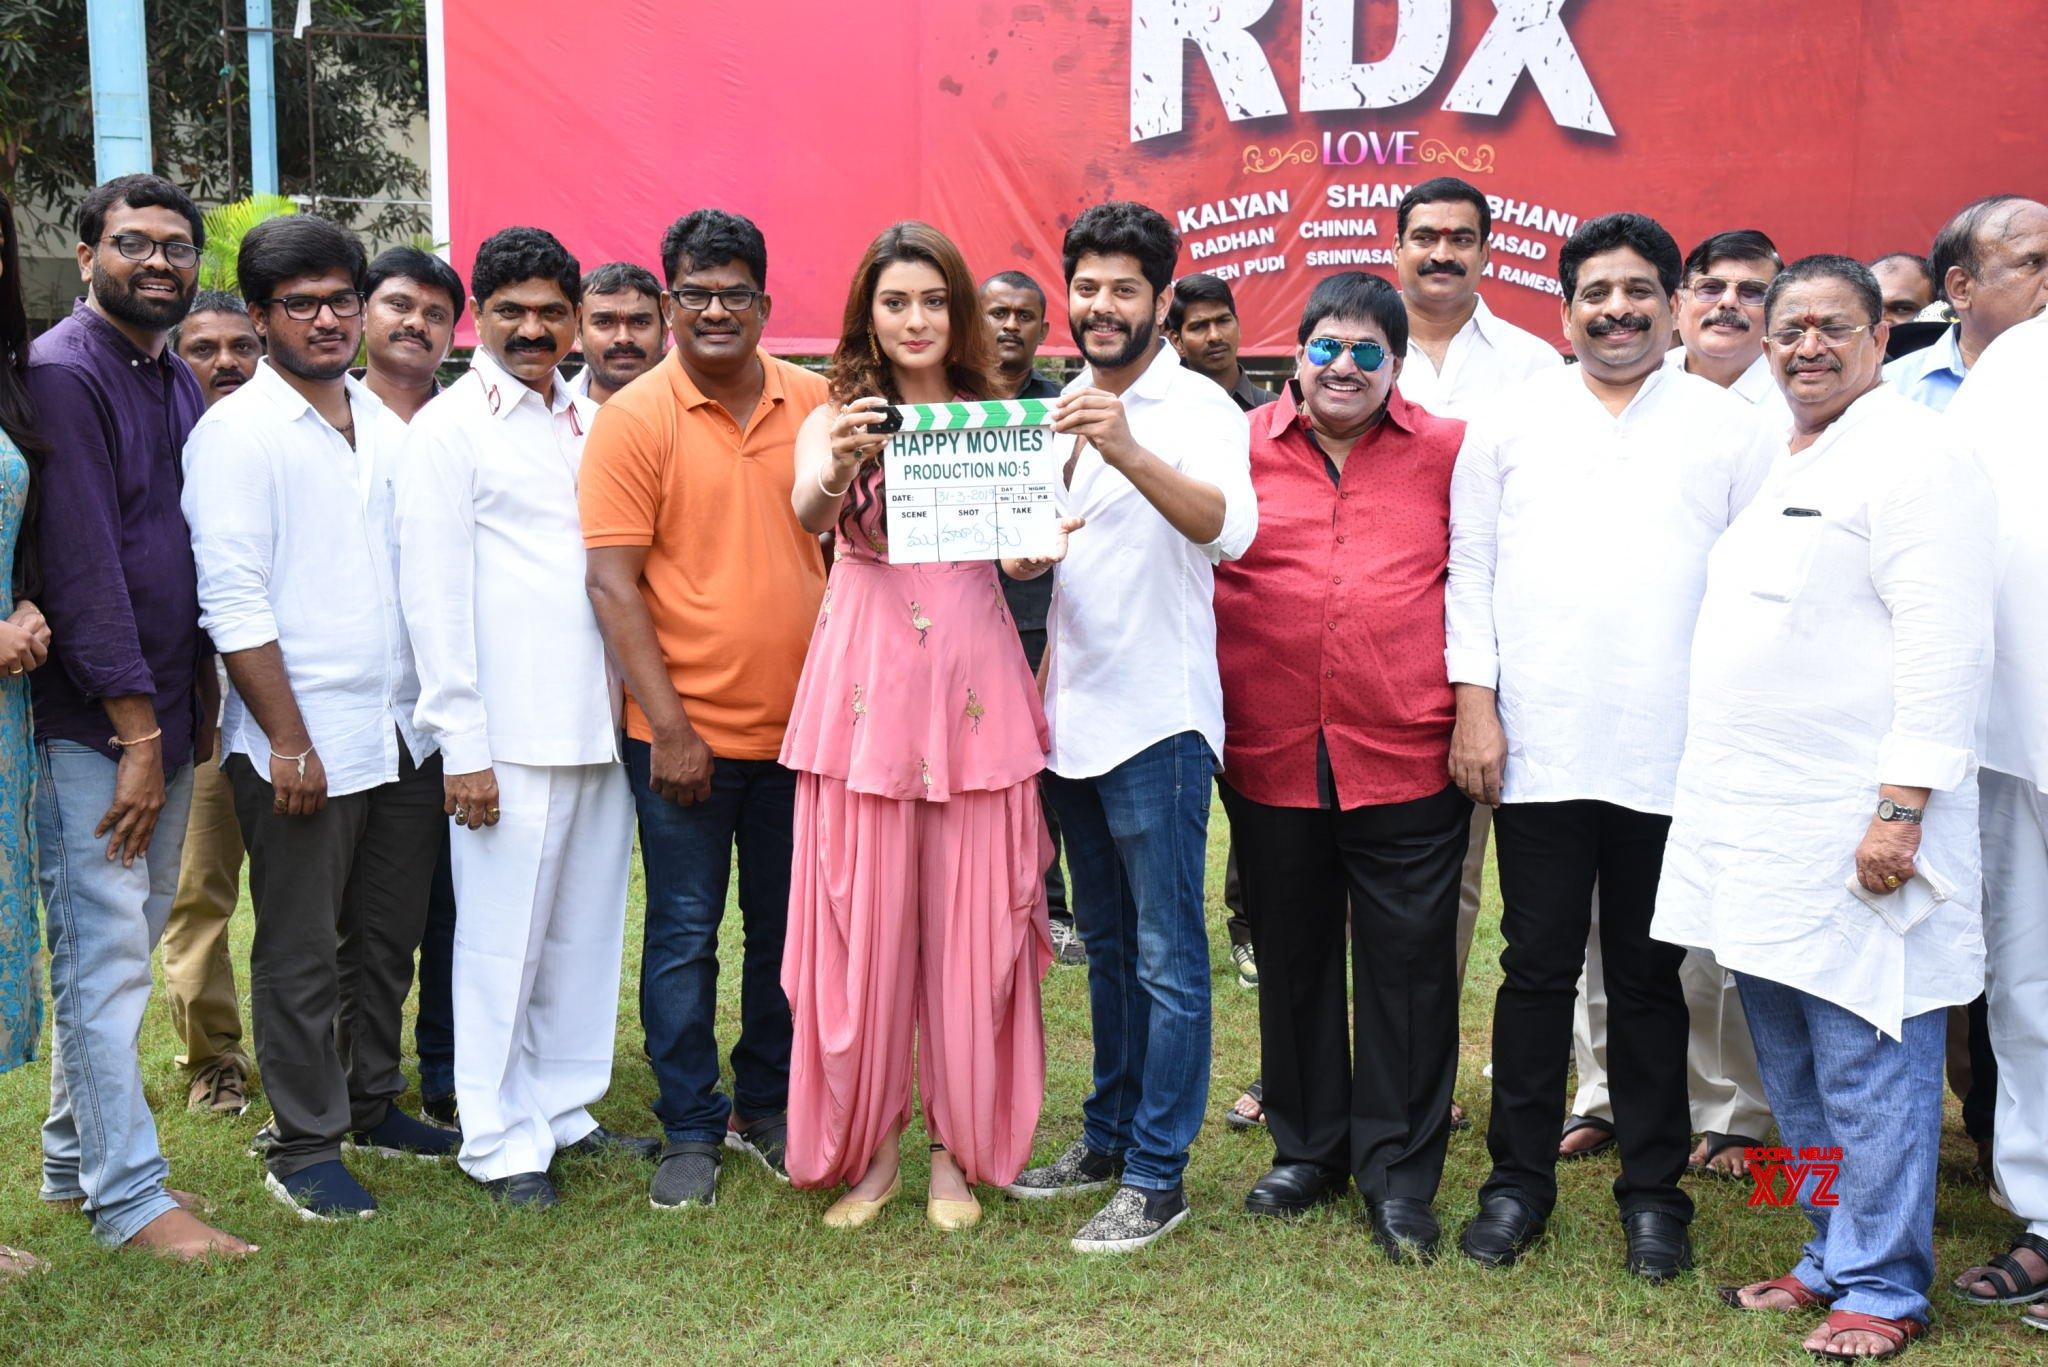 rdx movies 2019